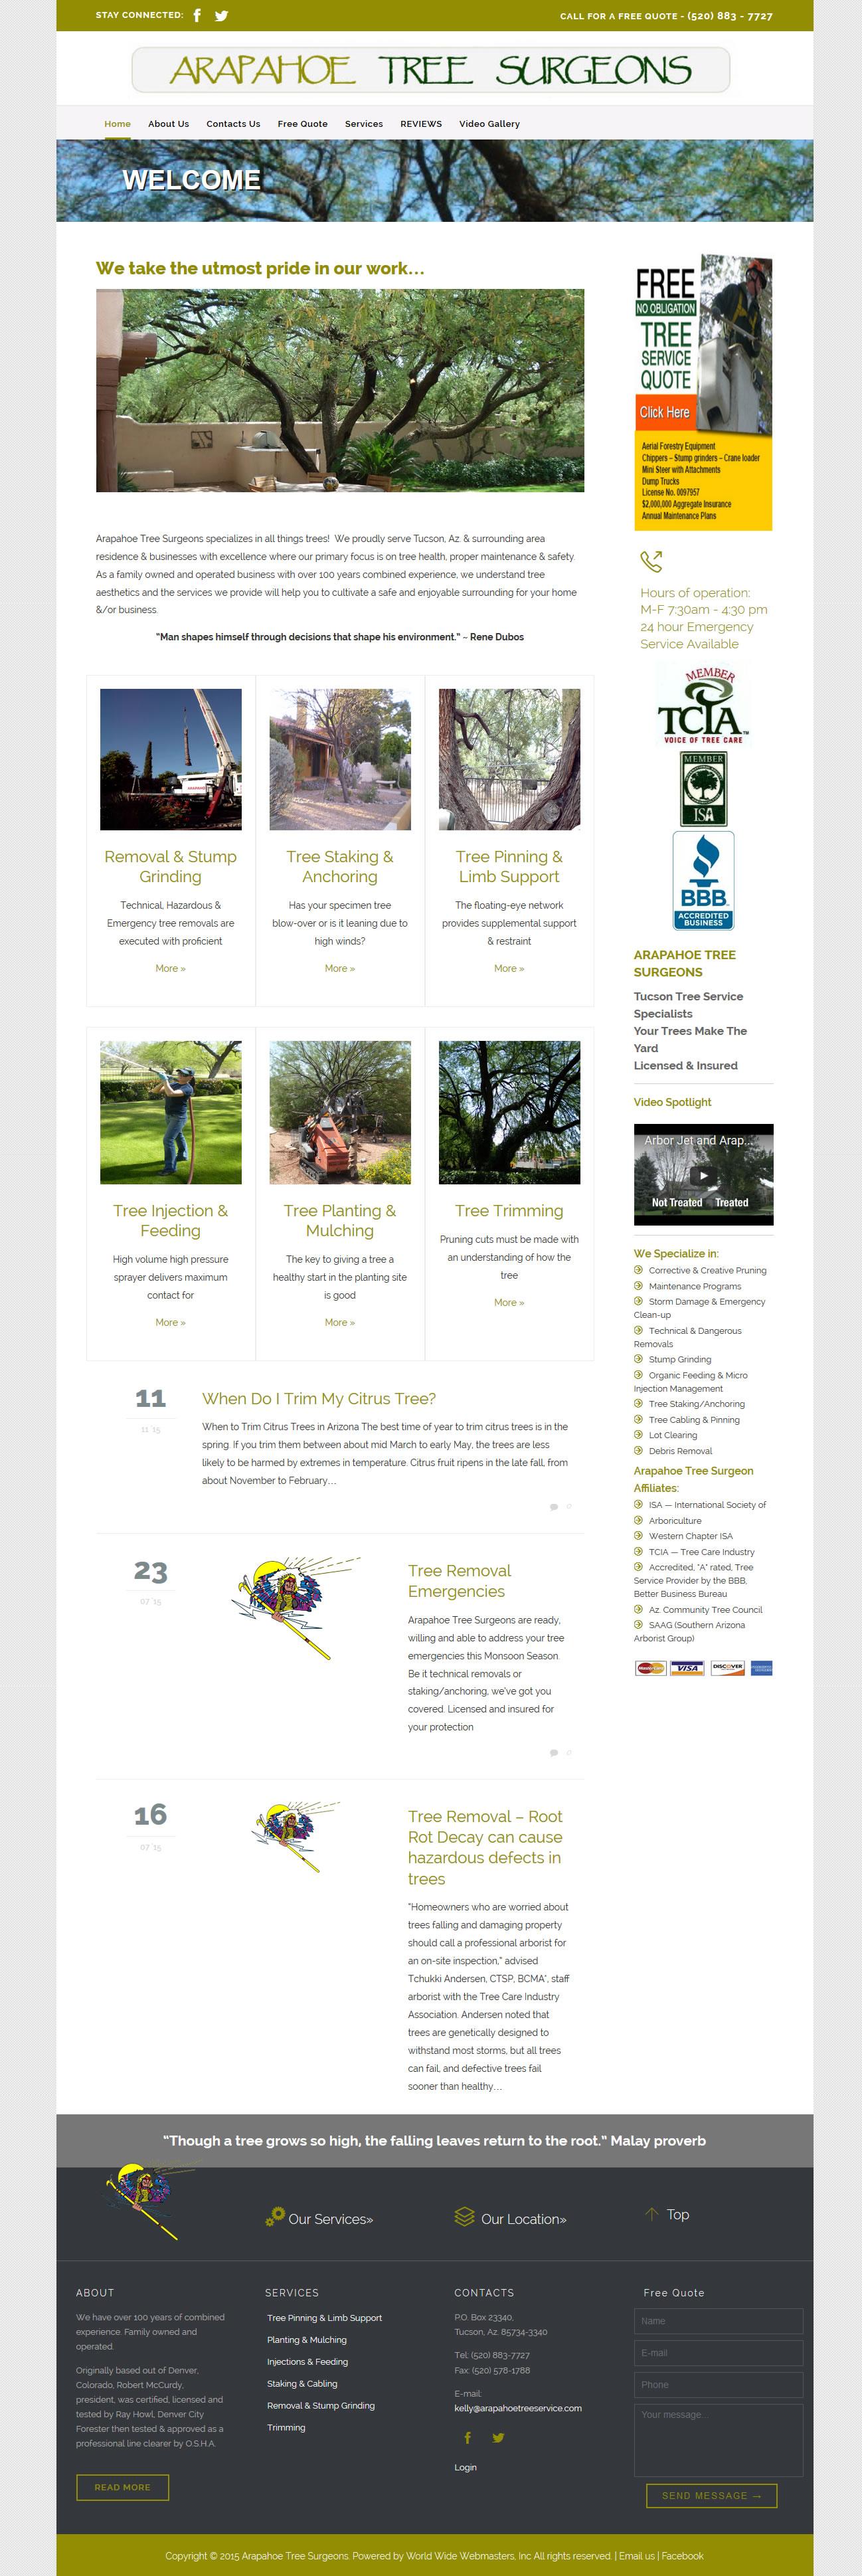 Arapahoe Tree Service